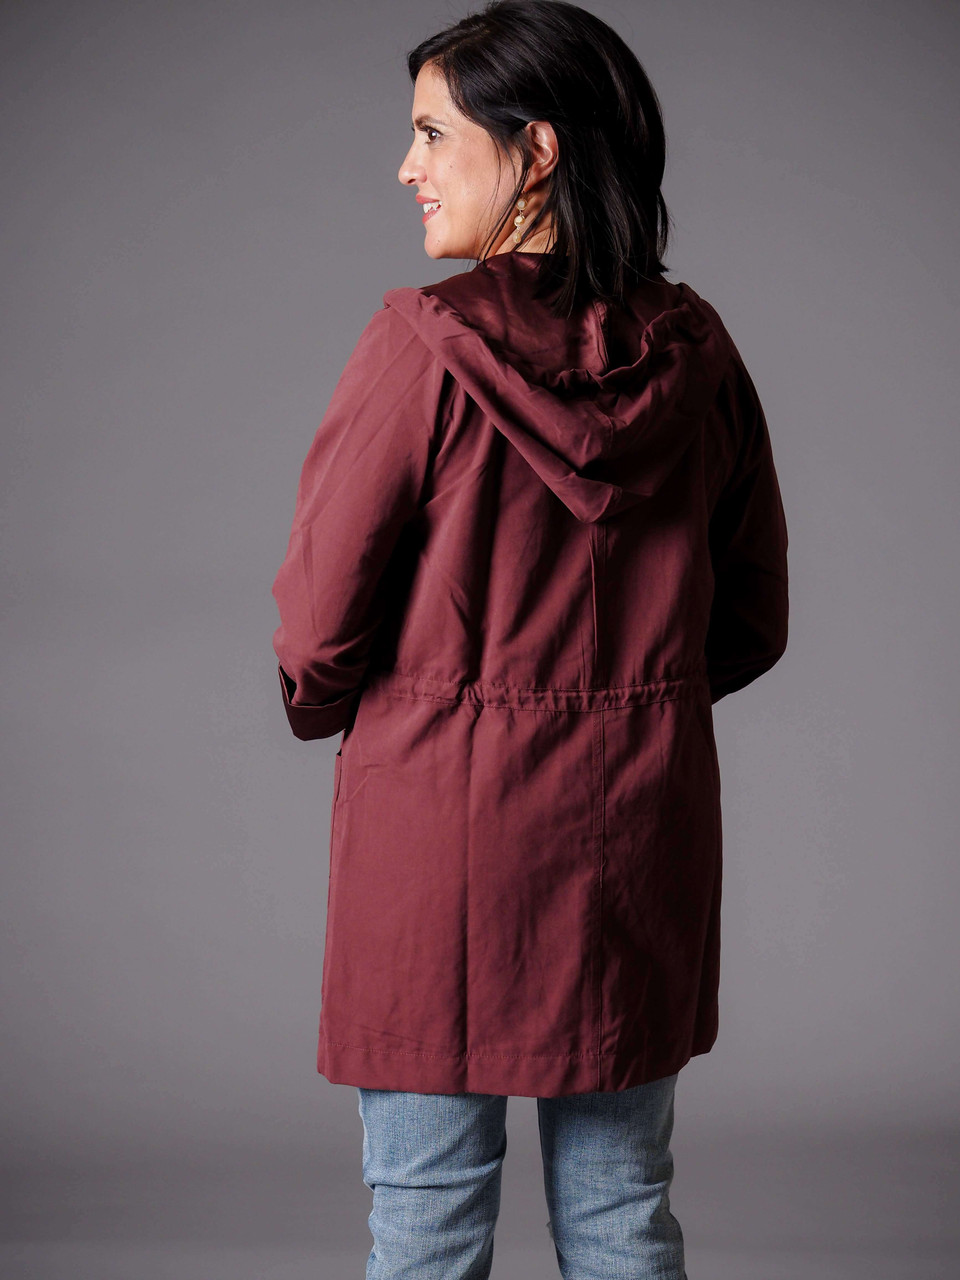 purple maroon burgundy hooded utility jacket